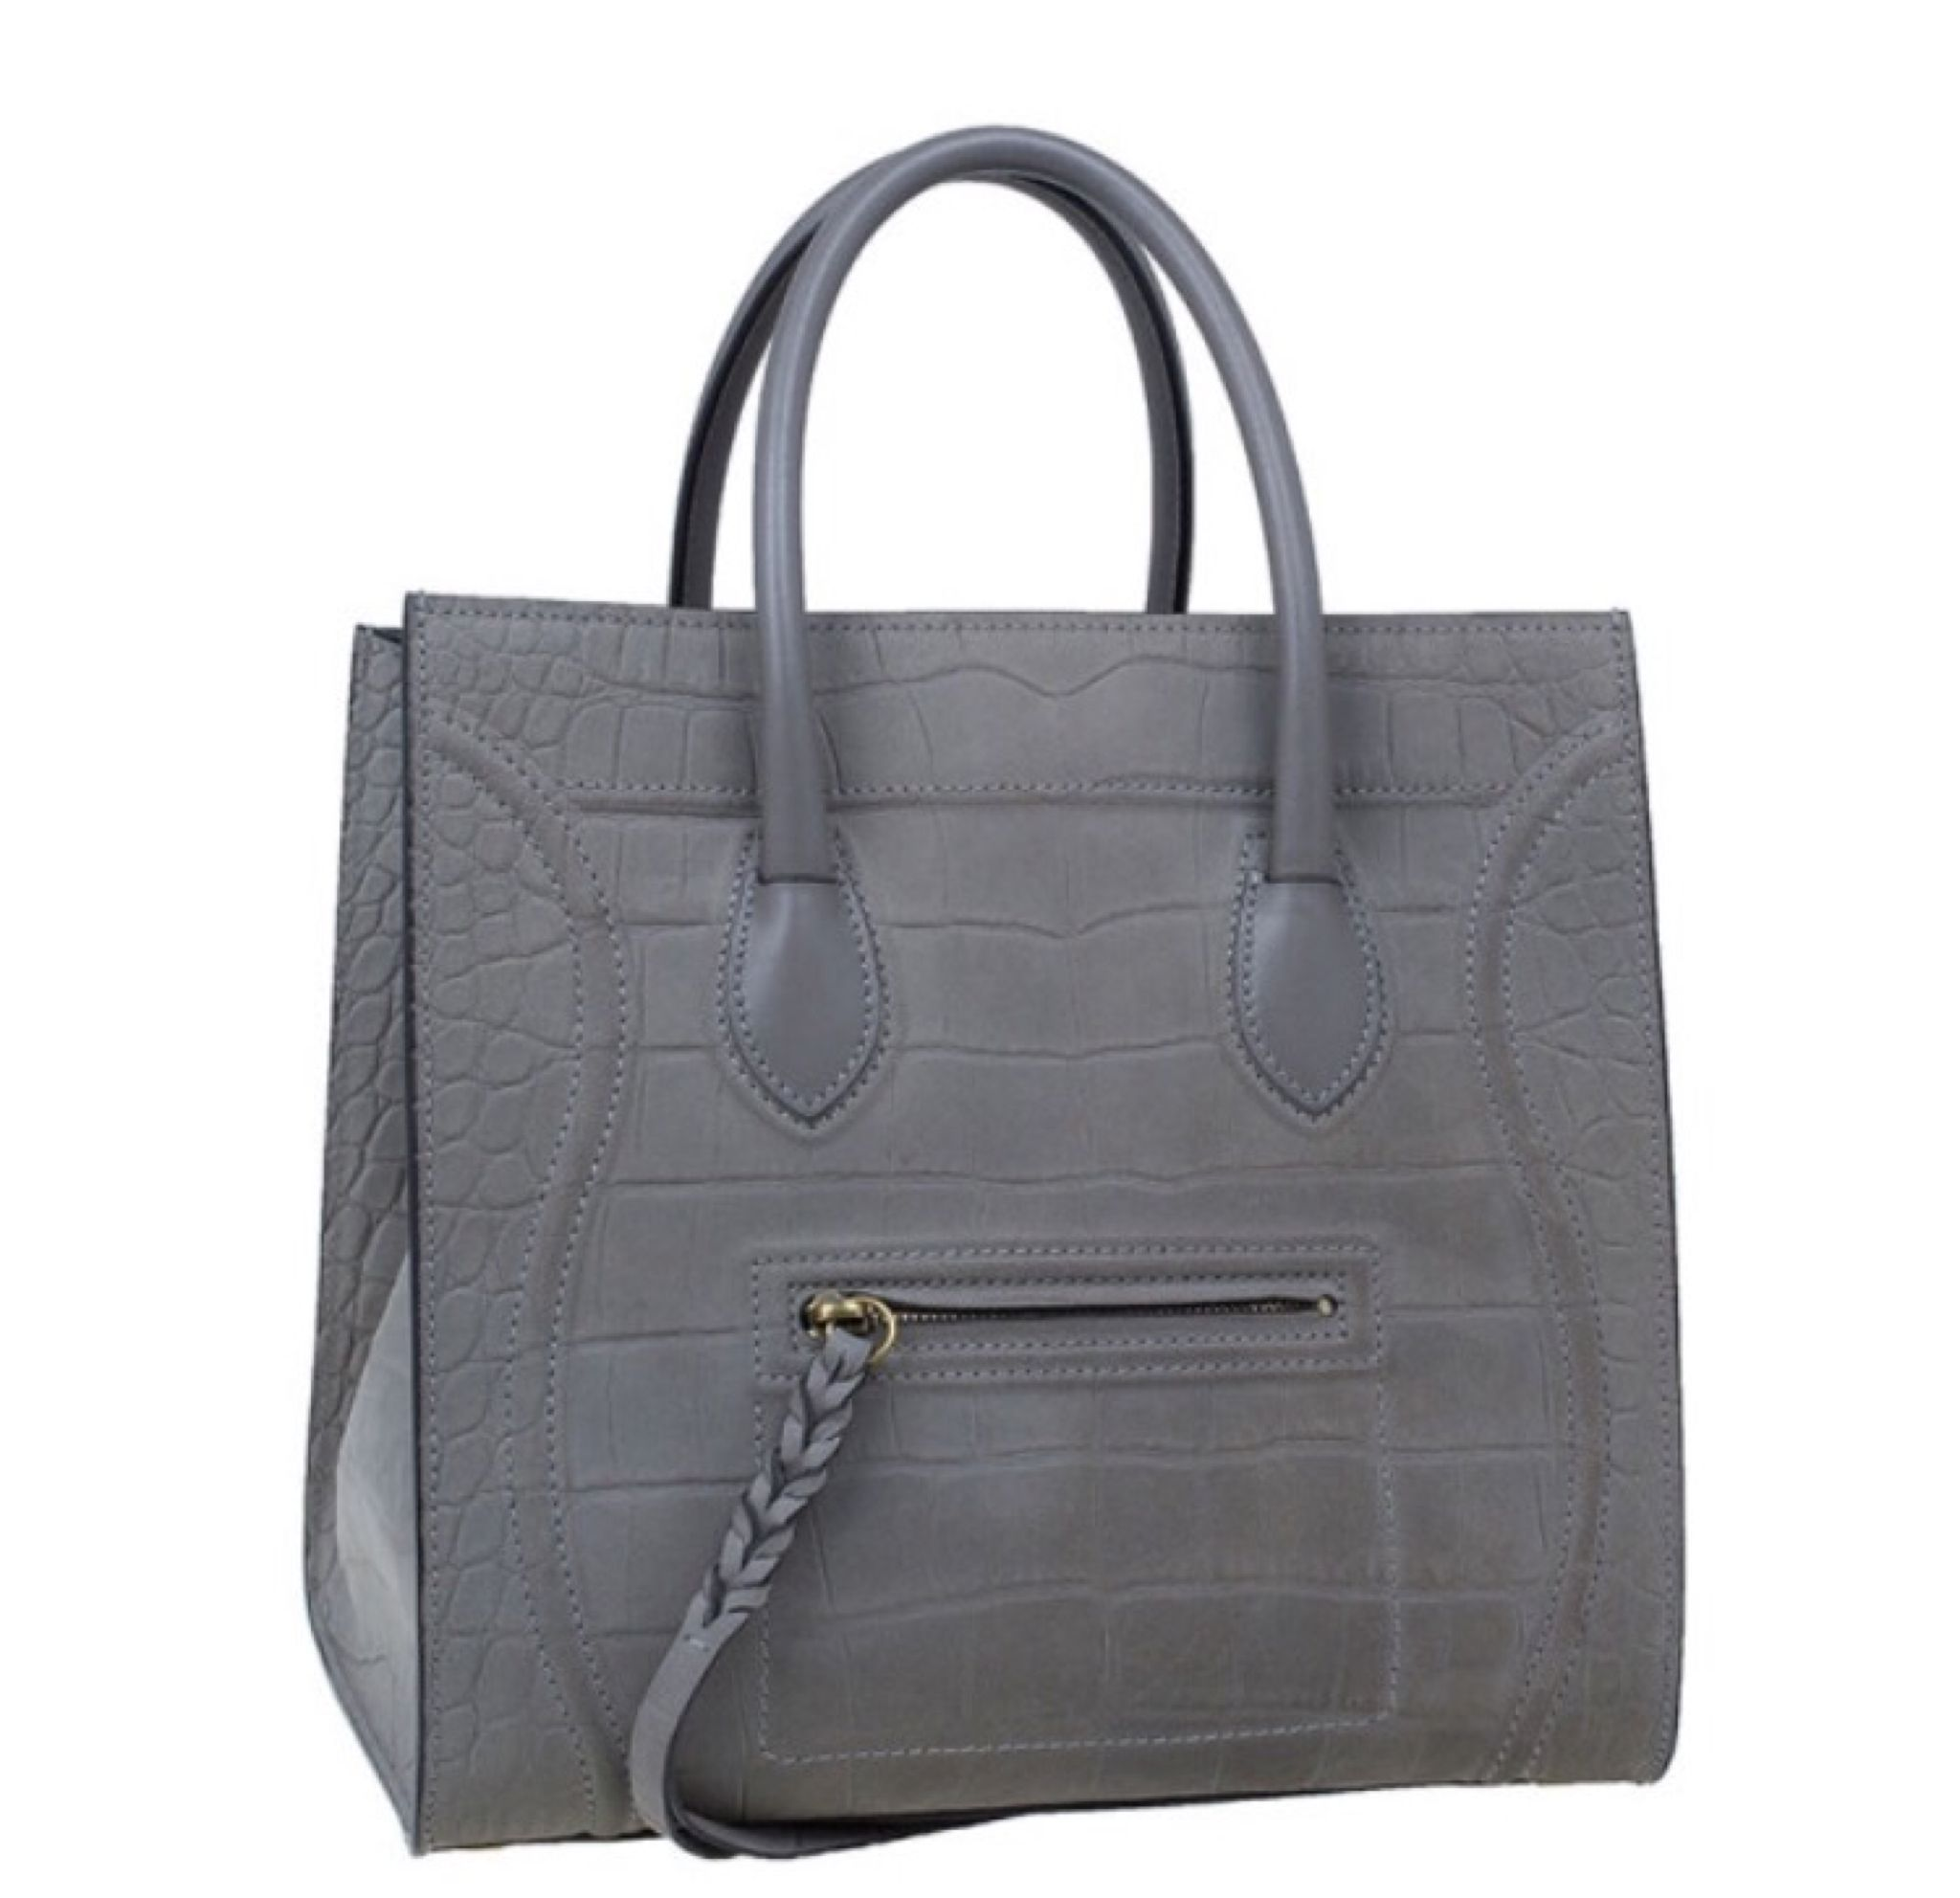 Celine Phantom Crocodile Bag